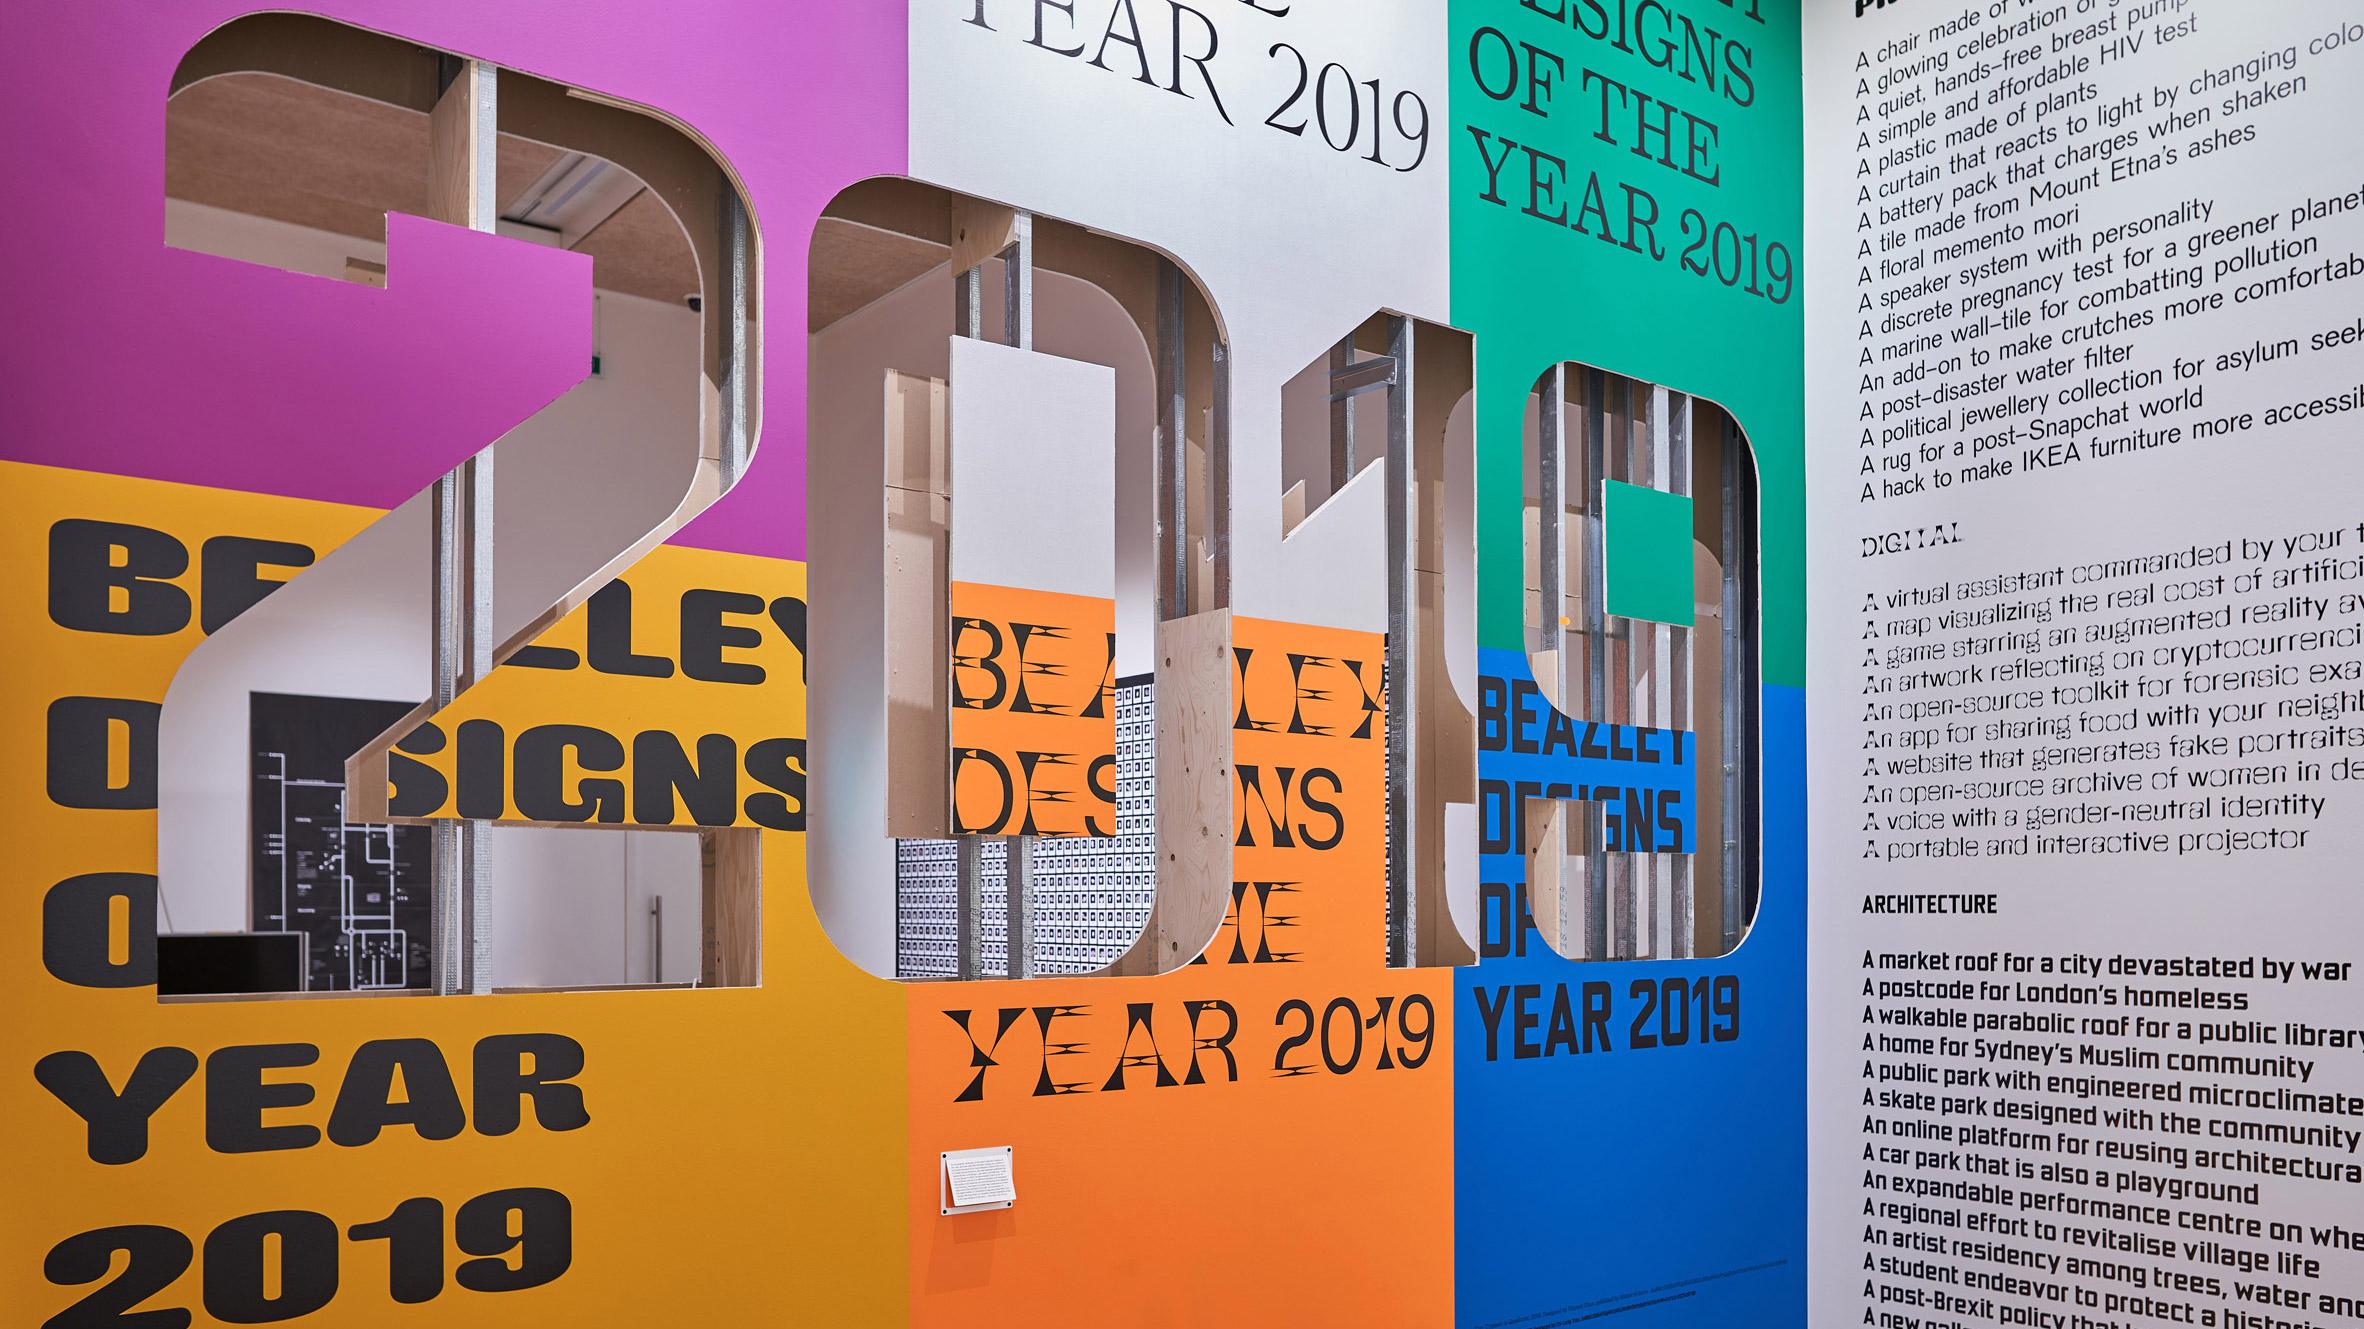 Beazley Designs of the Year 2019 nominees include genderless